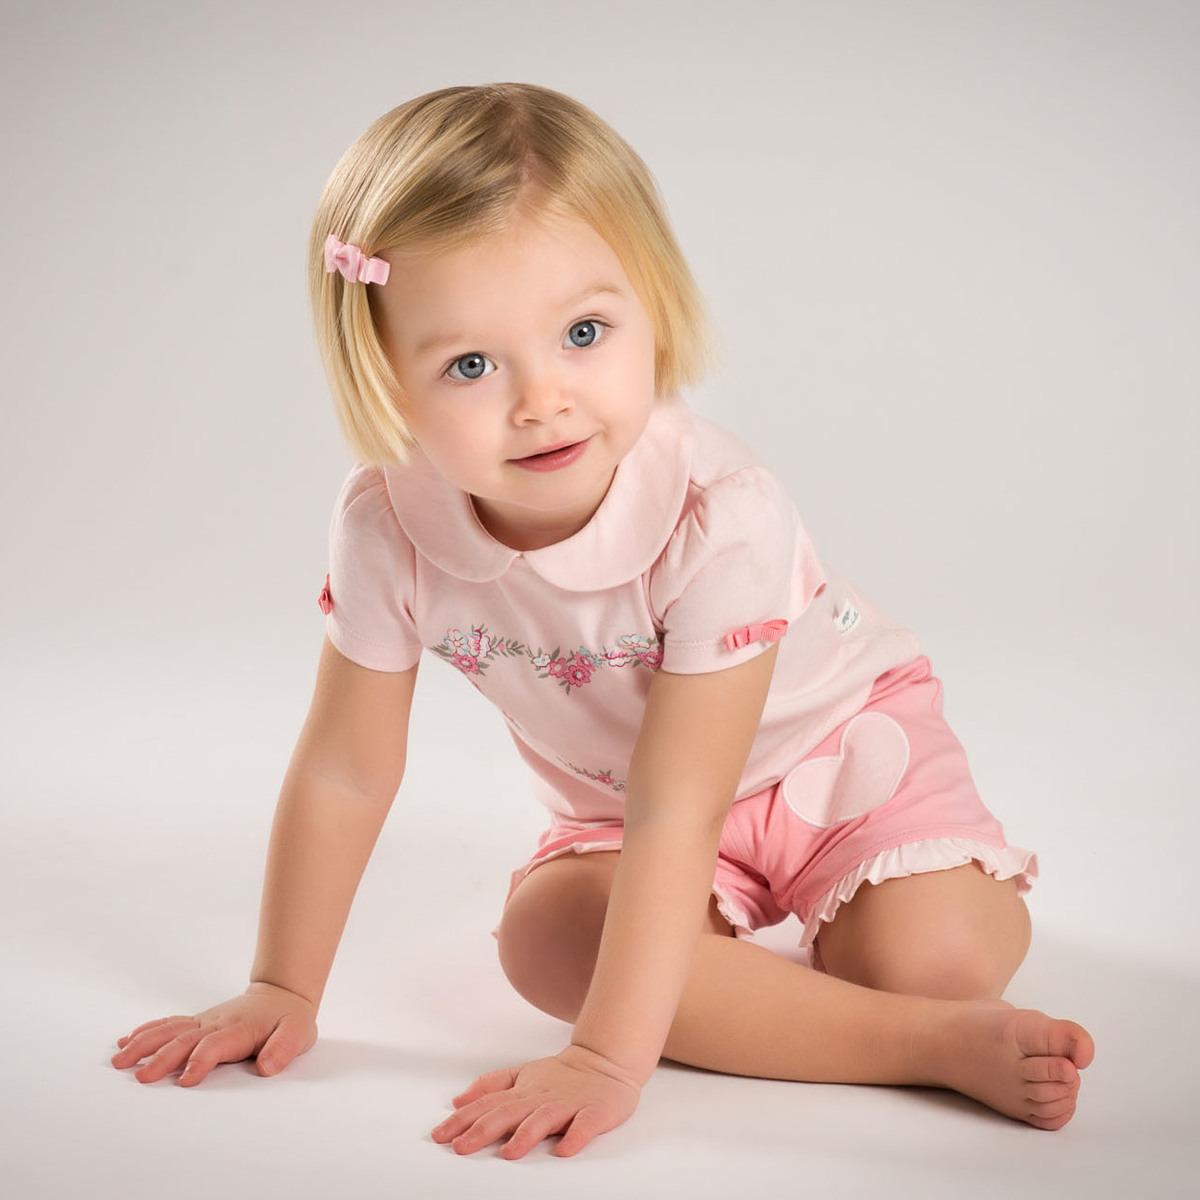 davebella戴维贝拉女童夏季新装套装 宝宝爱心花环套装DB5218